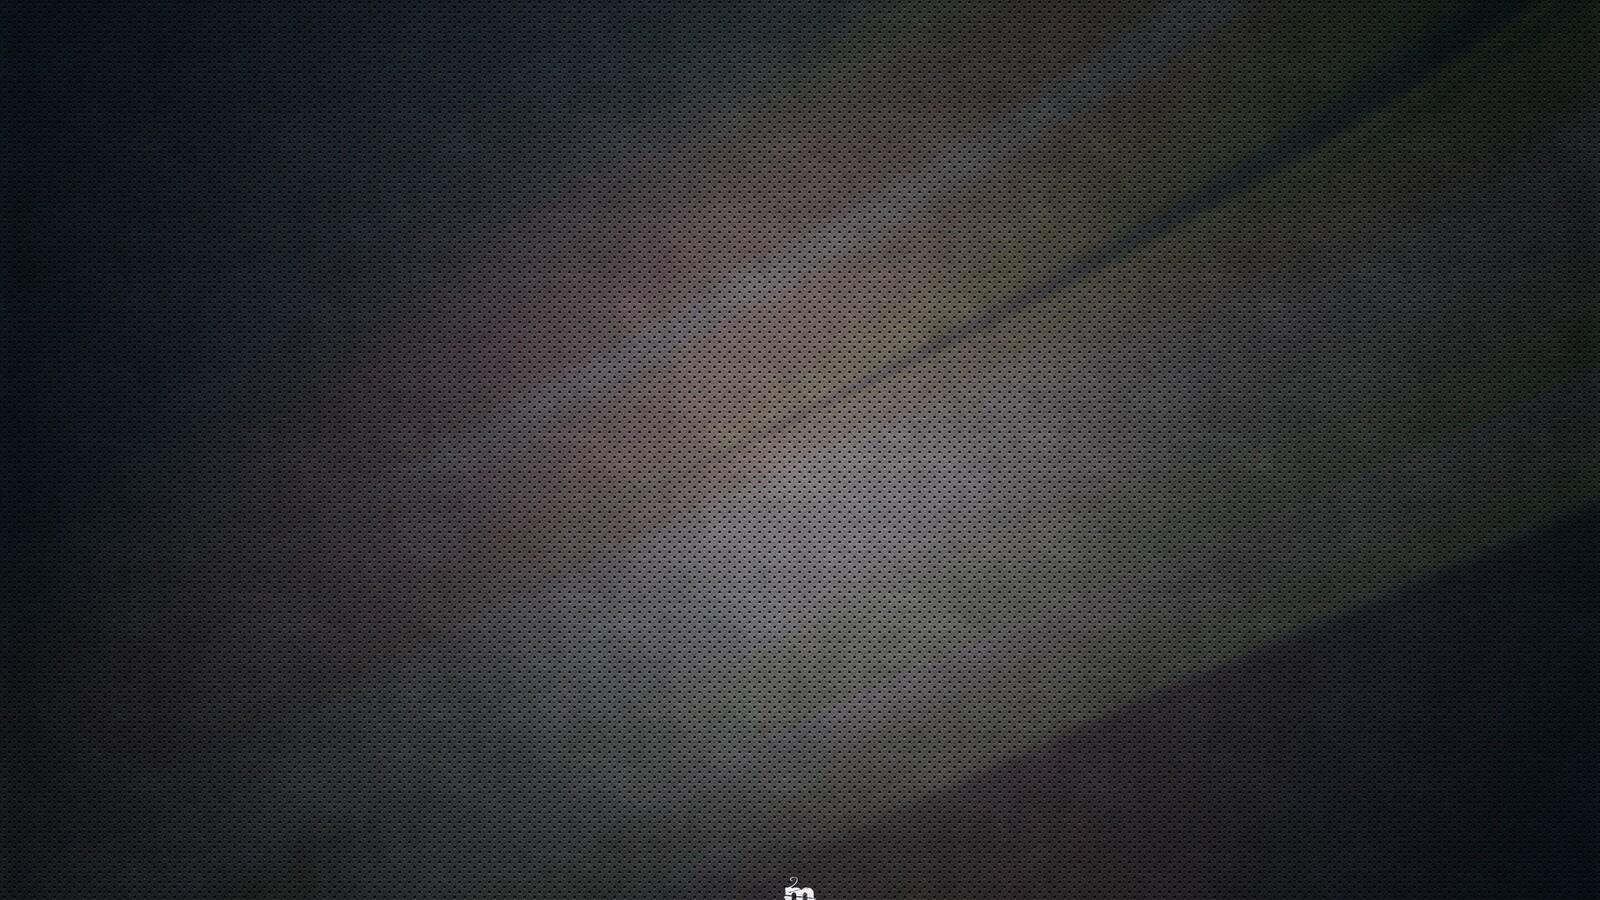 1600x900 Simple Texture 1600x900 Resolution HD 4k